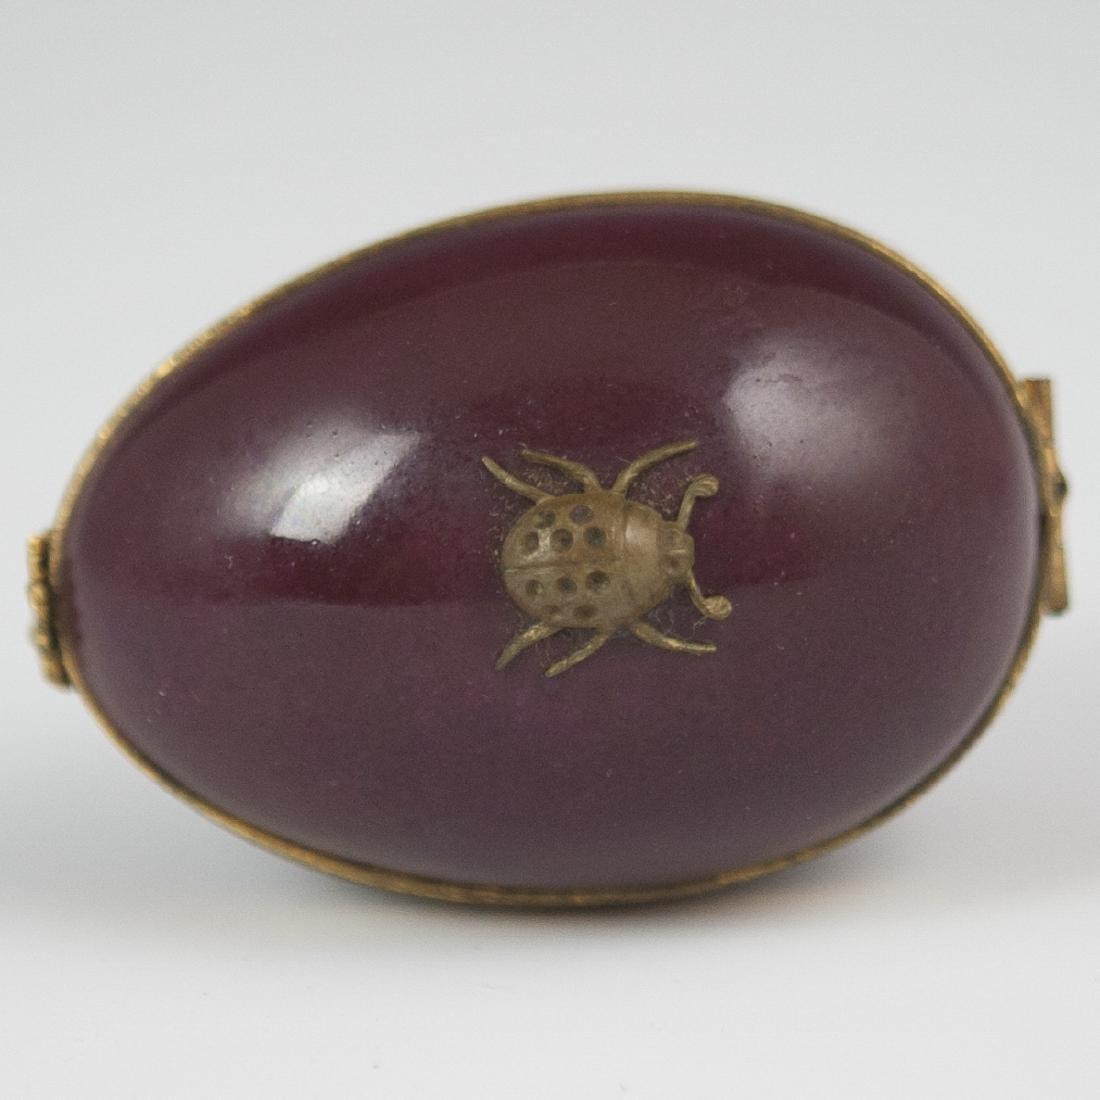 Limoges Porcelain Pill Box - 2